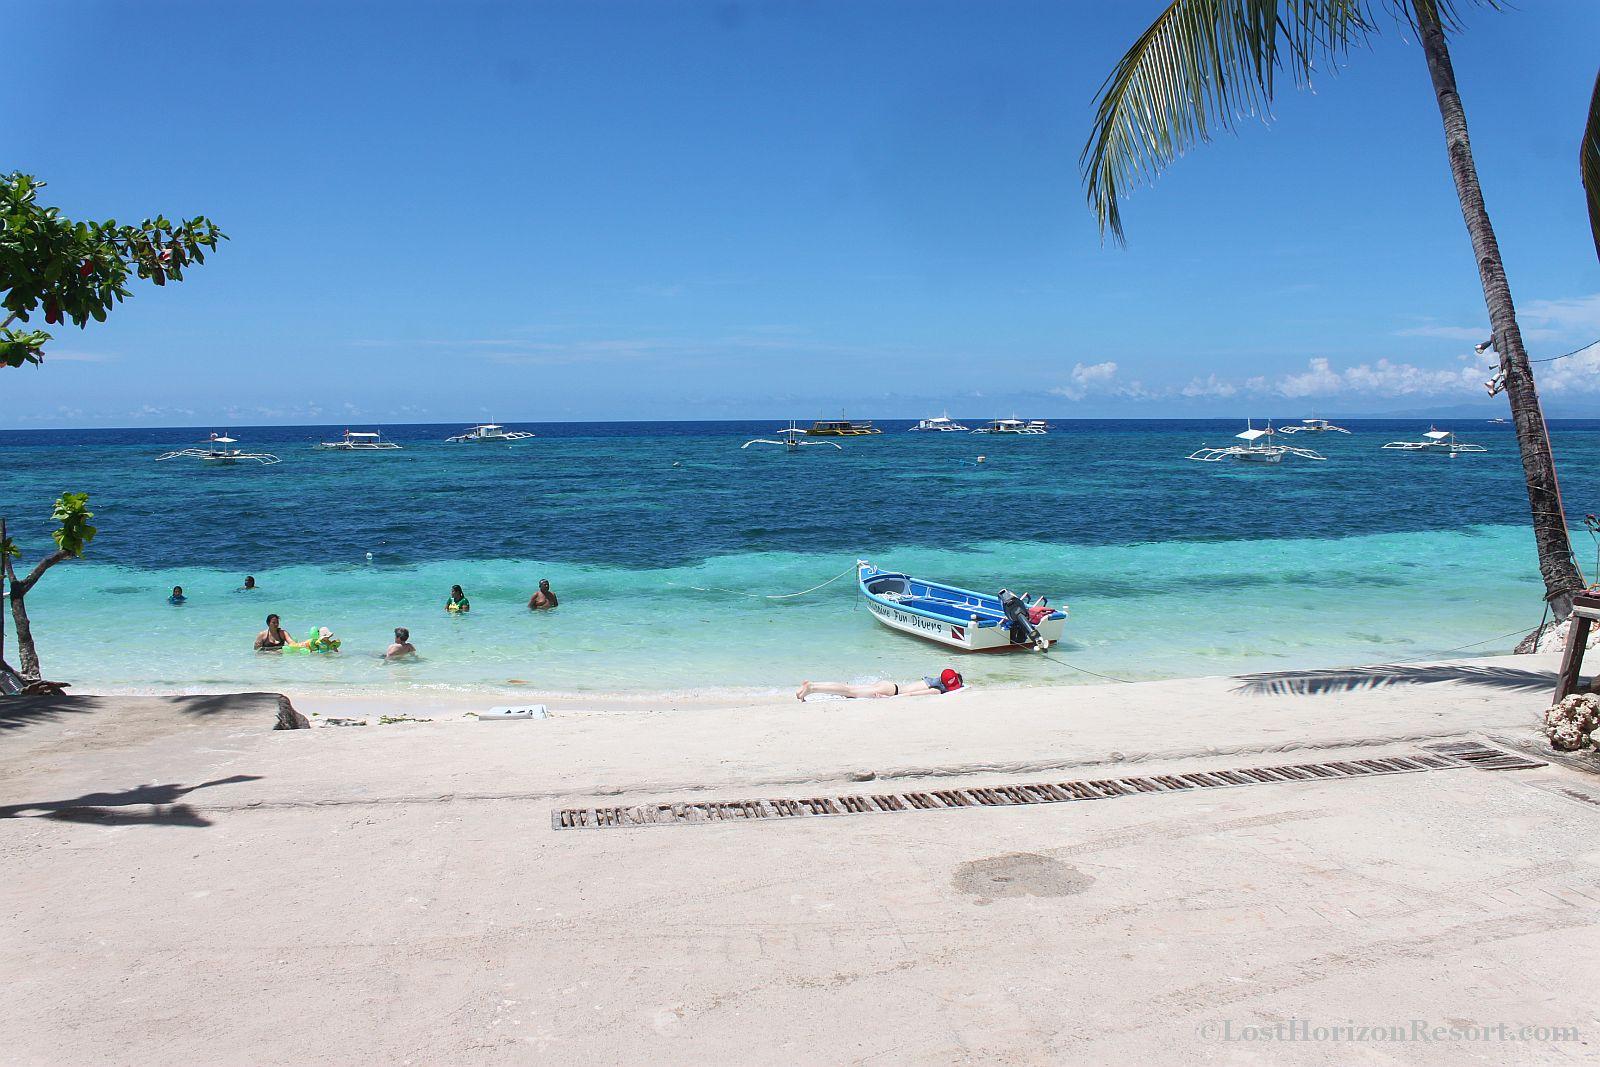 Lost Horizon Beach Resort In Alona Beach, Bohol